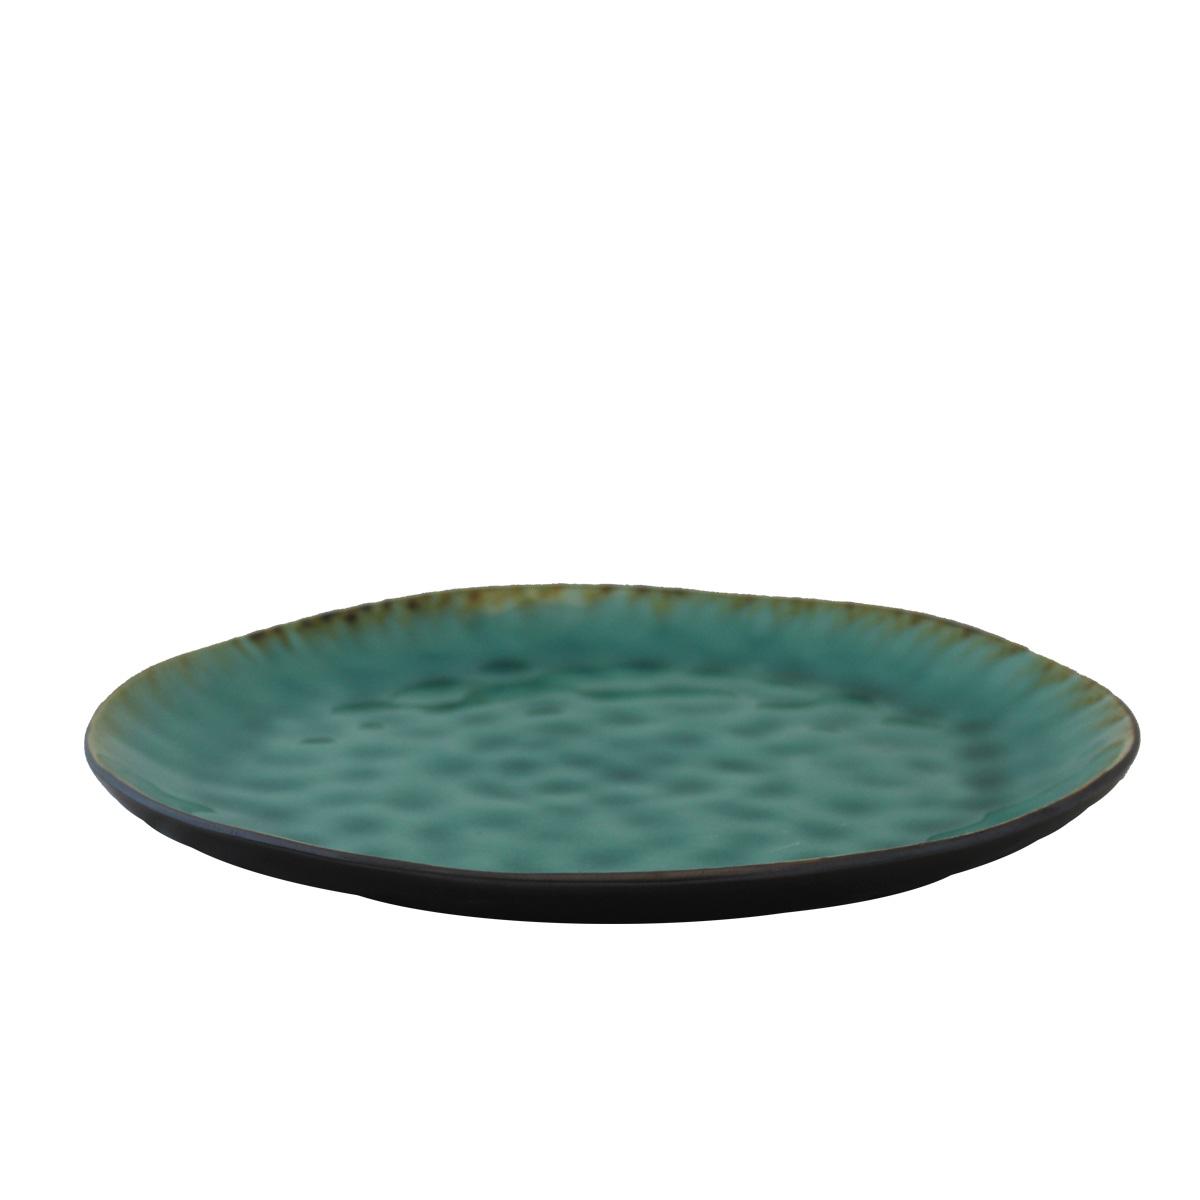 Tanjir keramički Blue MUS-092